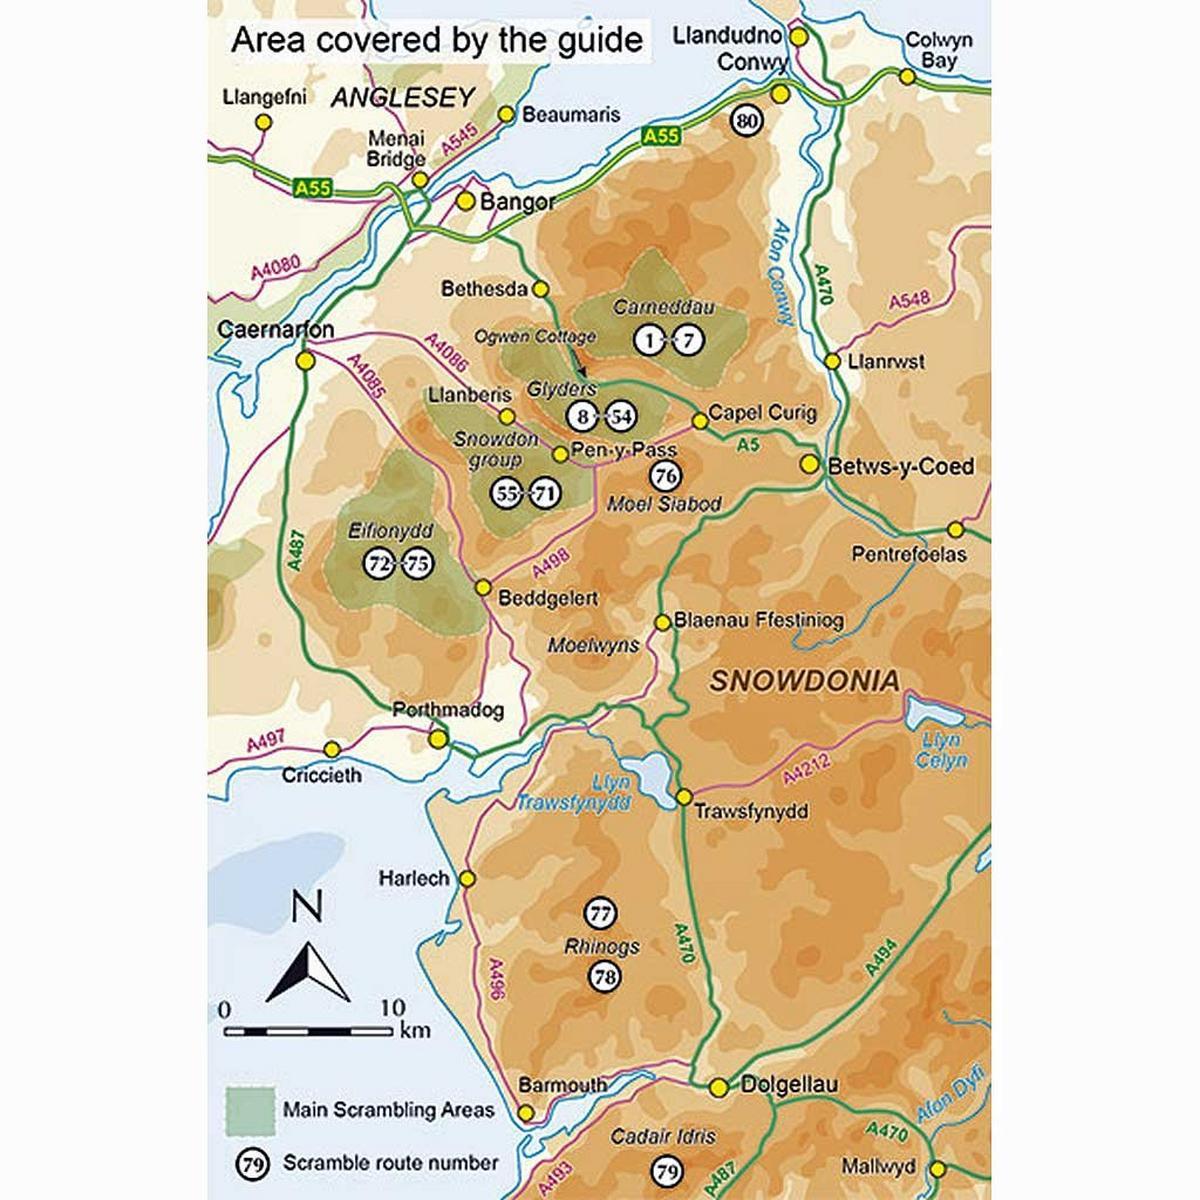 Cicerone Guide Book: Scrambles in Snowdonia